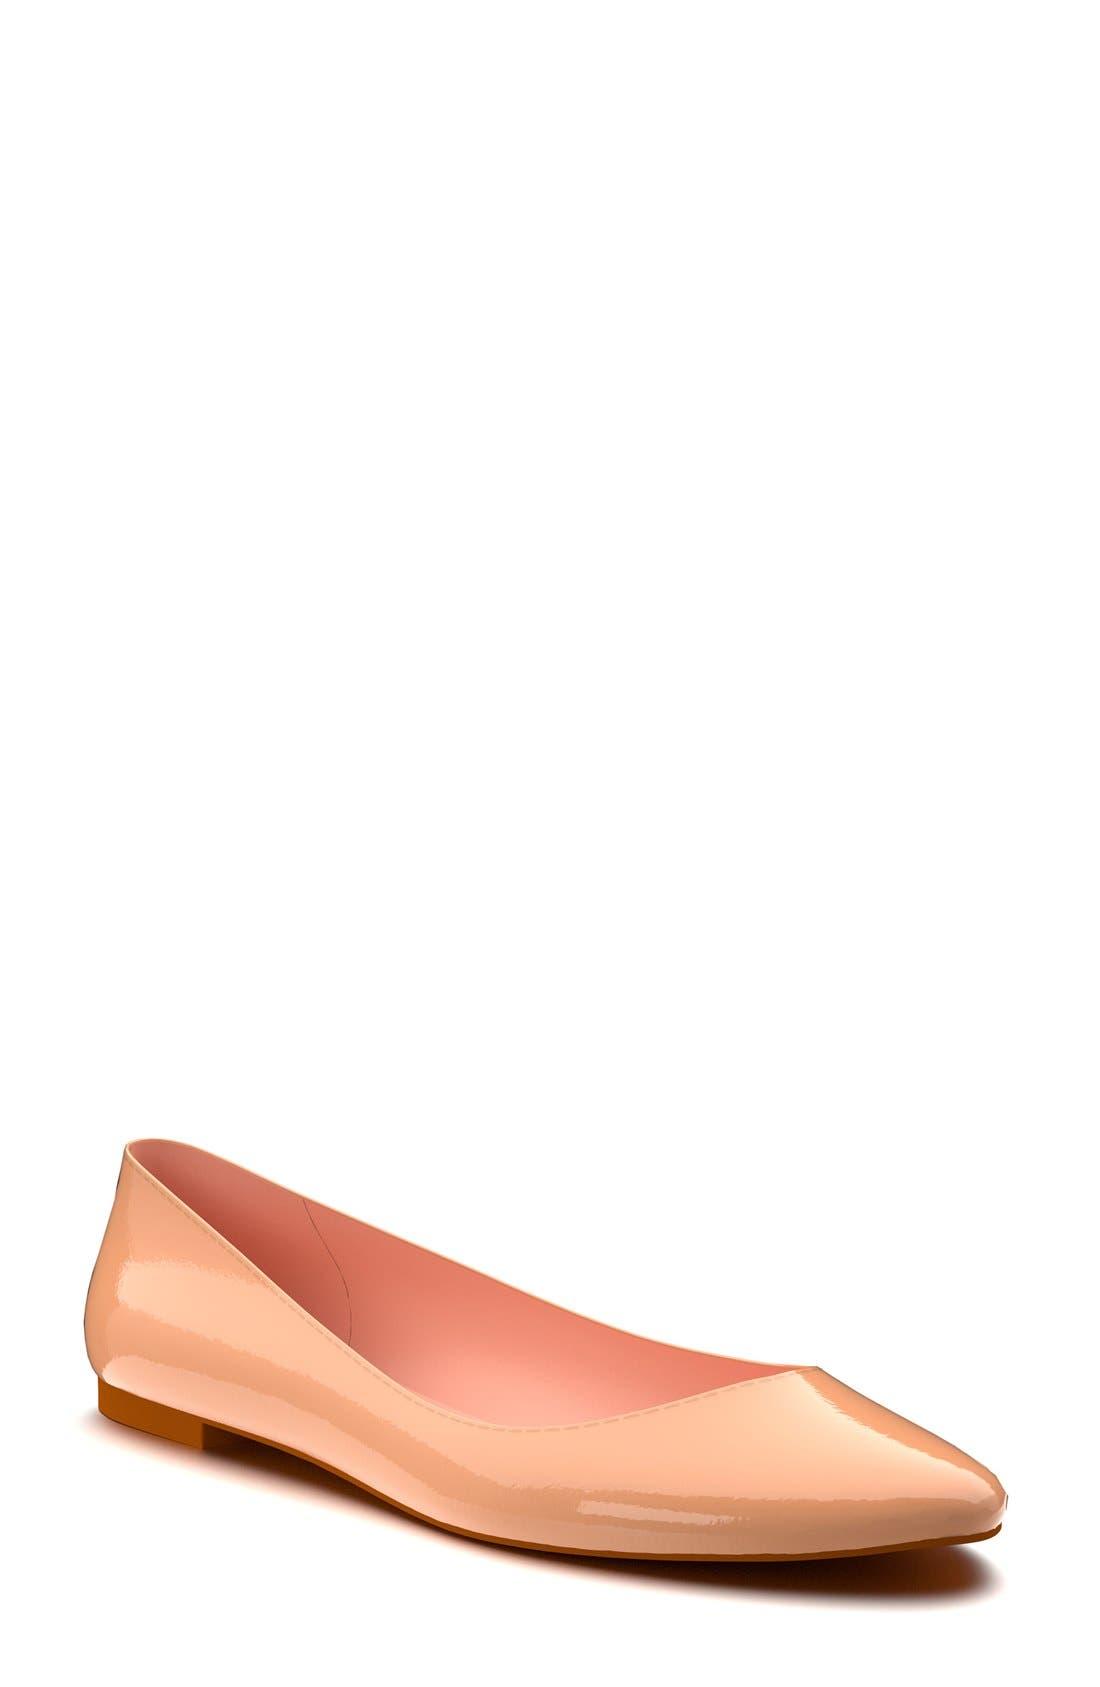 Shoes of Prey Ballet Flat (Women)